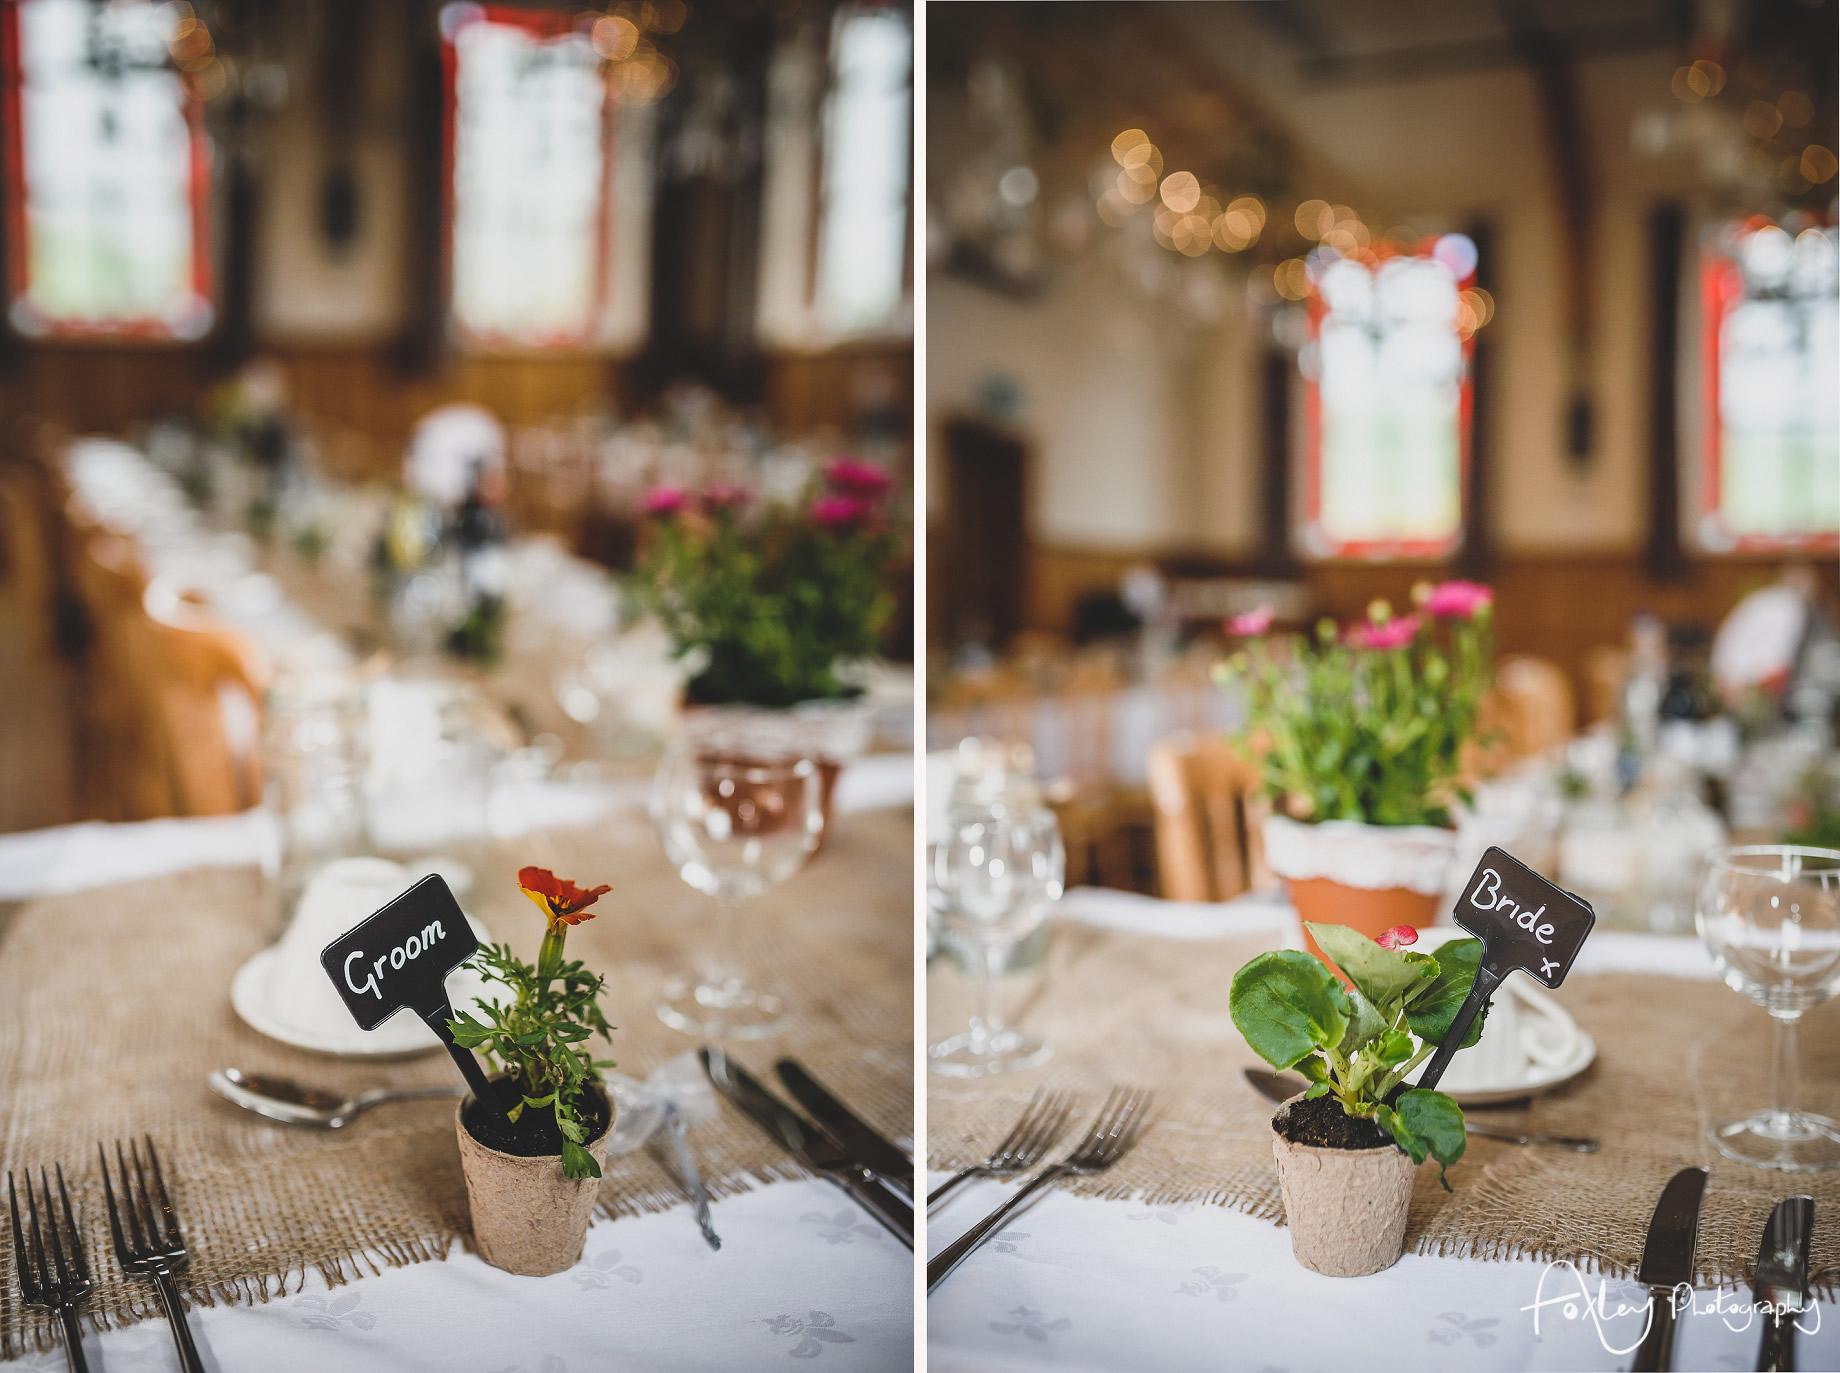 Mel-and-Lewis-Wedding-at-Barley-Village-Hall-126